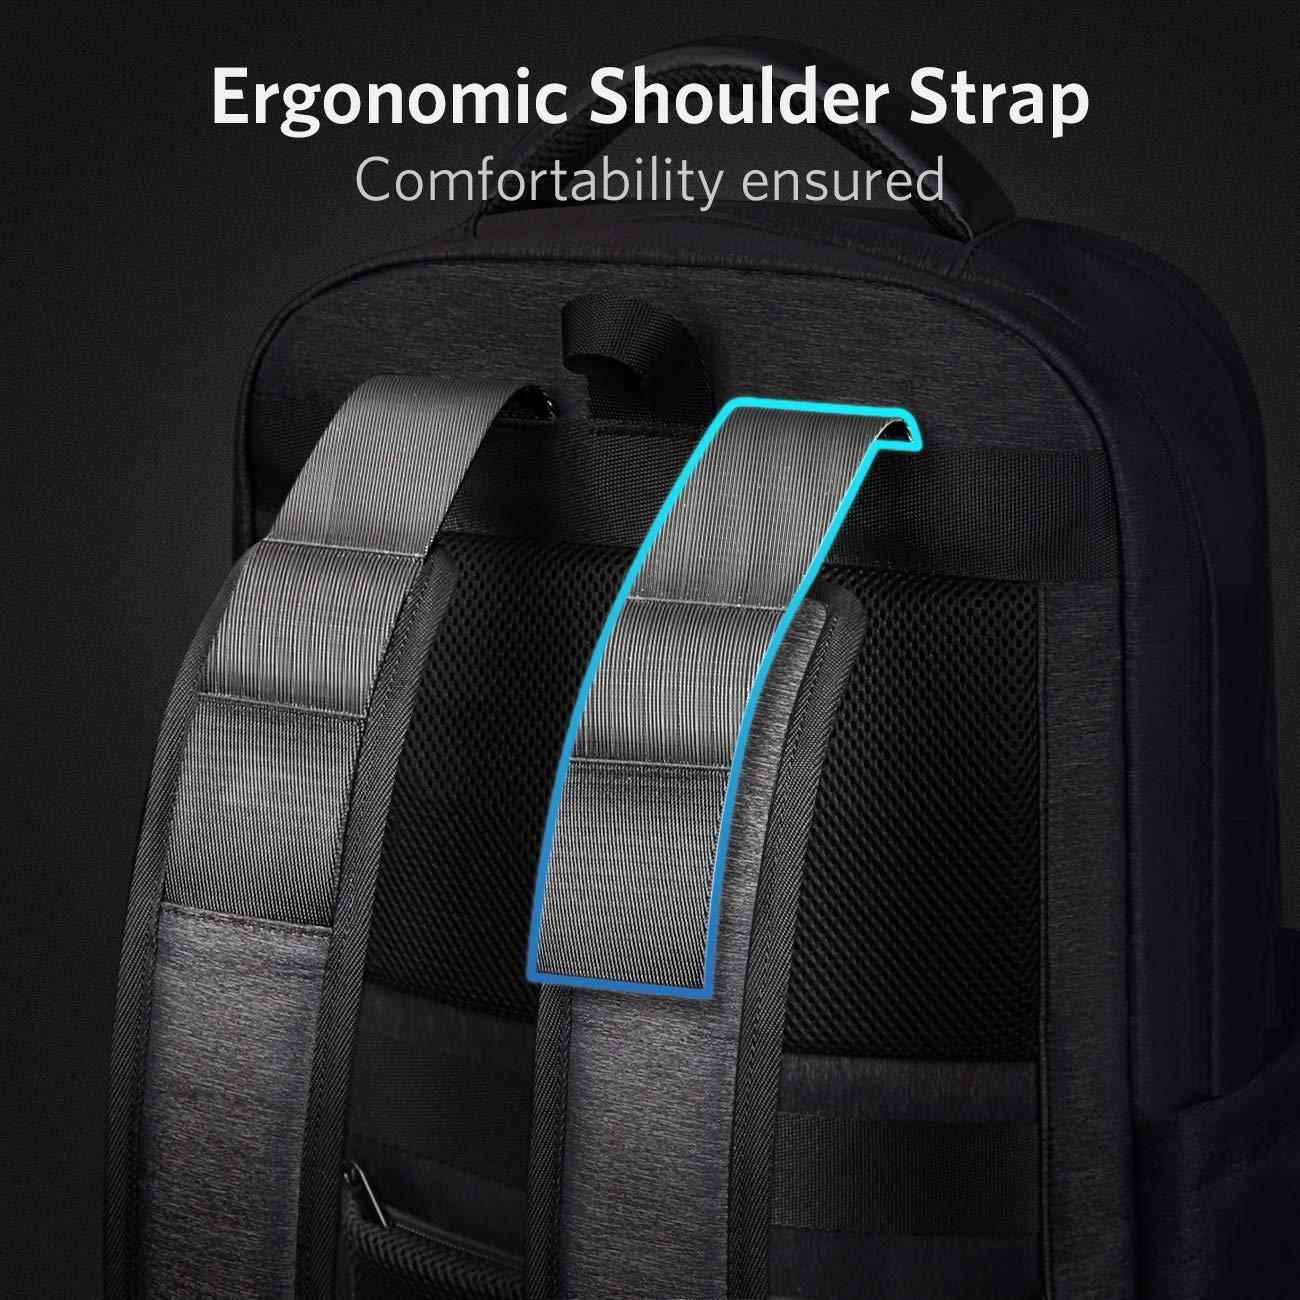 Inateck Slim Laptop Backpack Fits 15.6 Inch Laptops, Business Travel Bag Rucksack with Waterproof Rain Cover USB Charging Port , Dark Grey